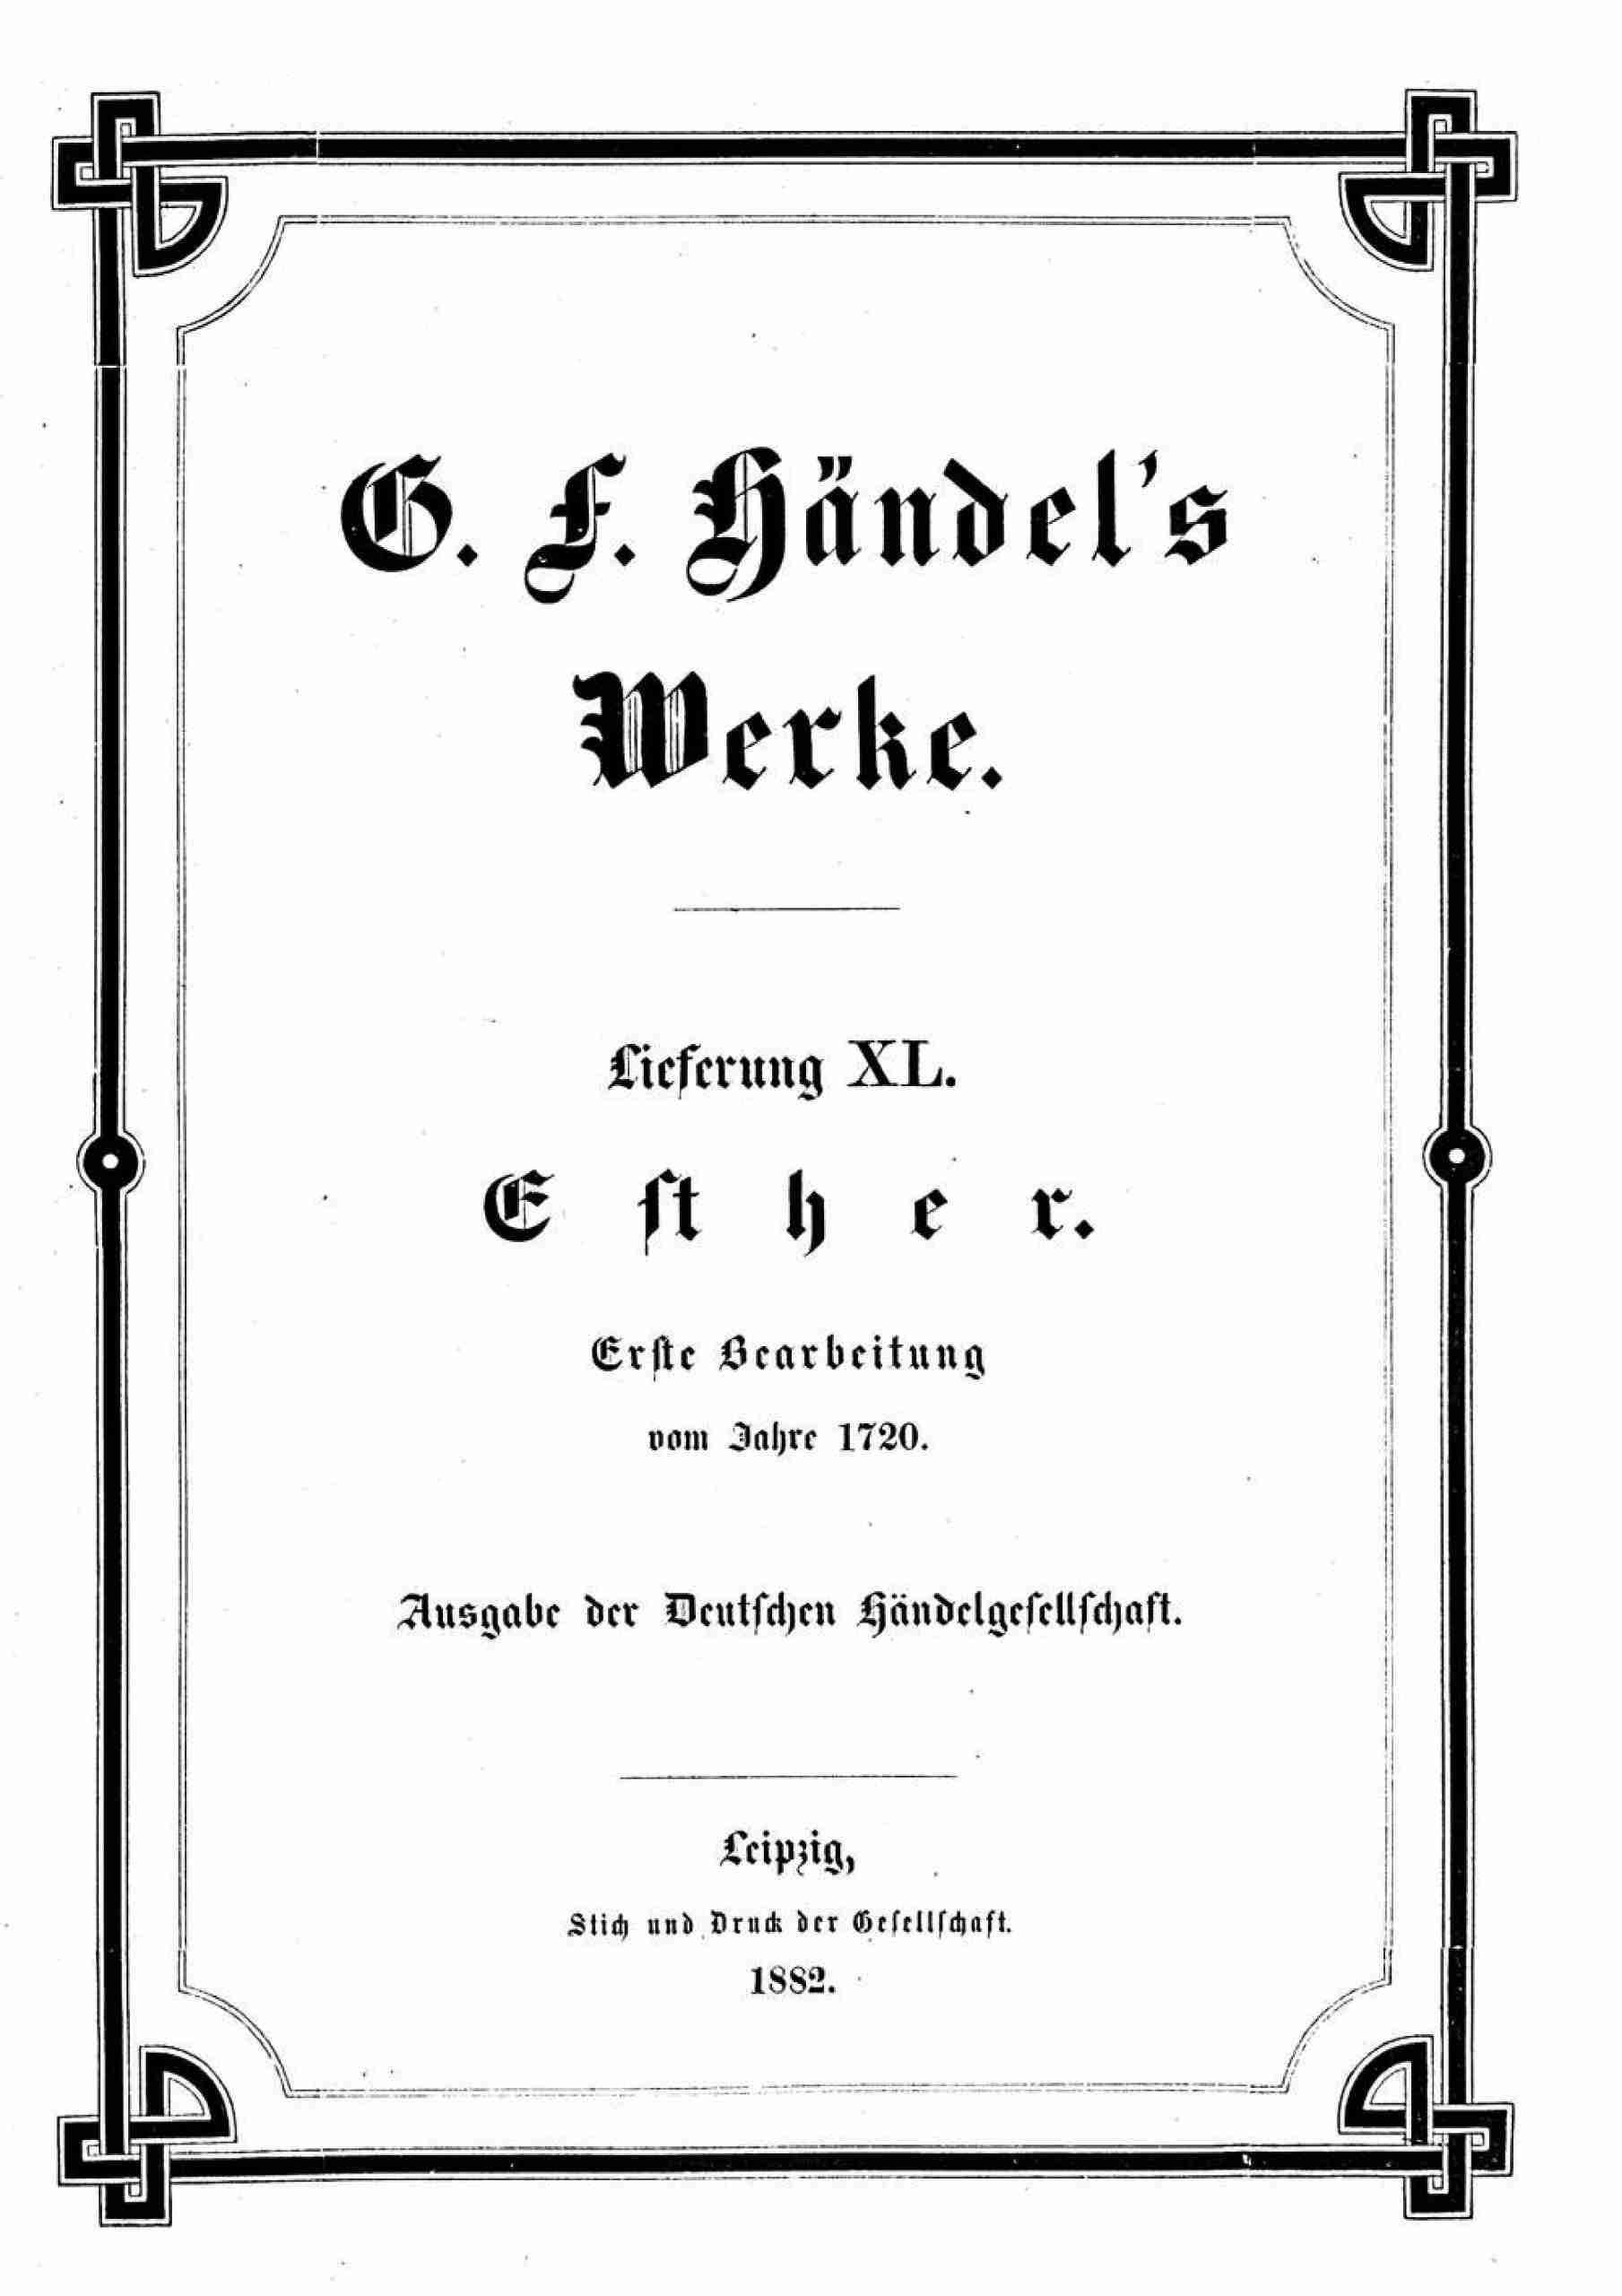 Handel, George Frideric - Esther, HWV 50a